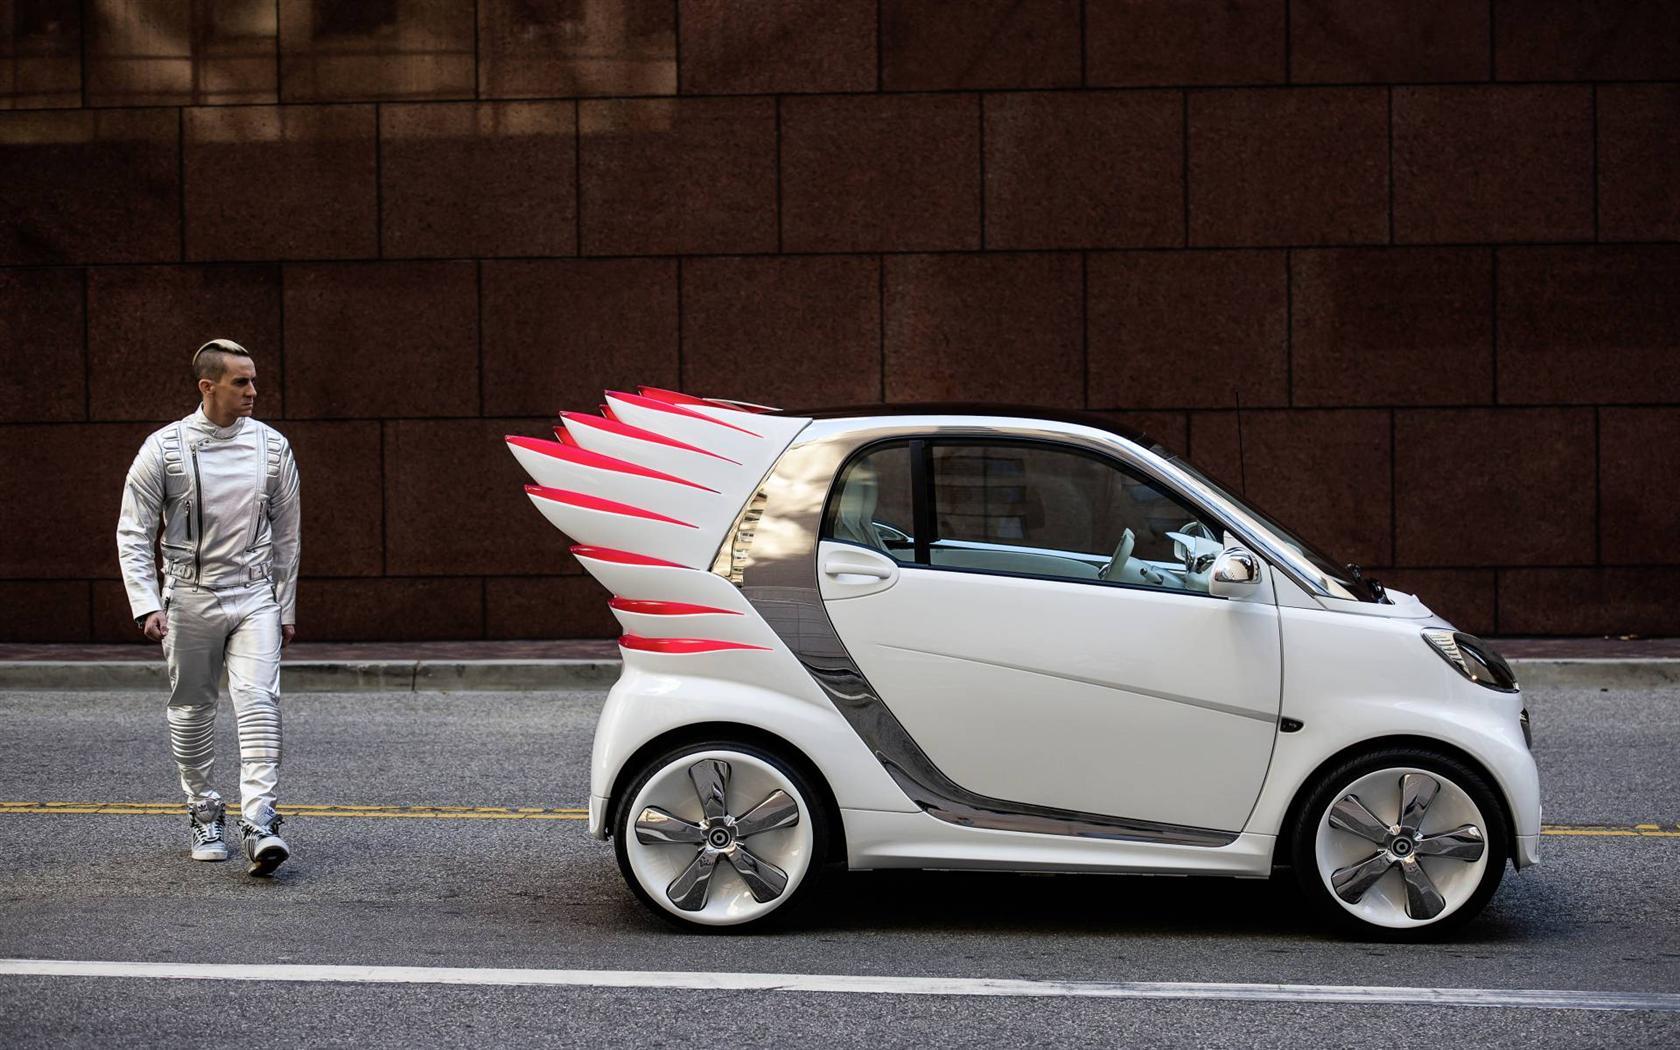 2013 Smart fortwo Jeremy Scott Concept Image  Photo 16 of 50